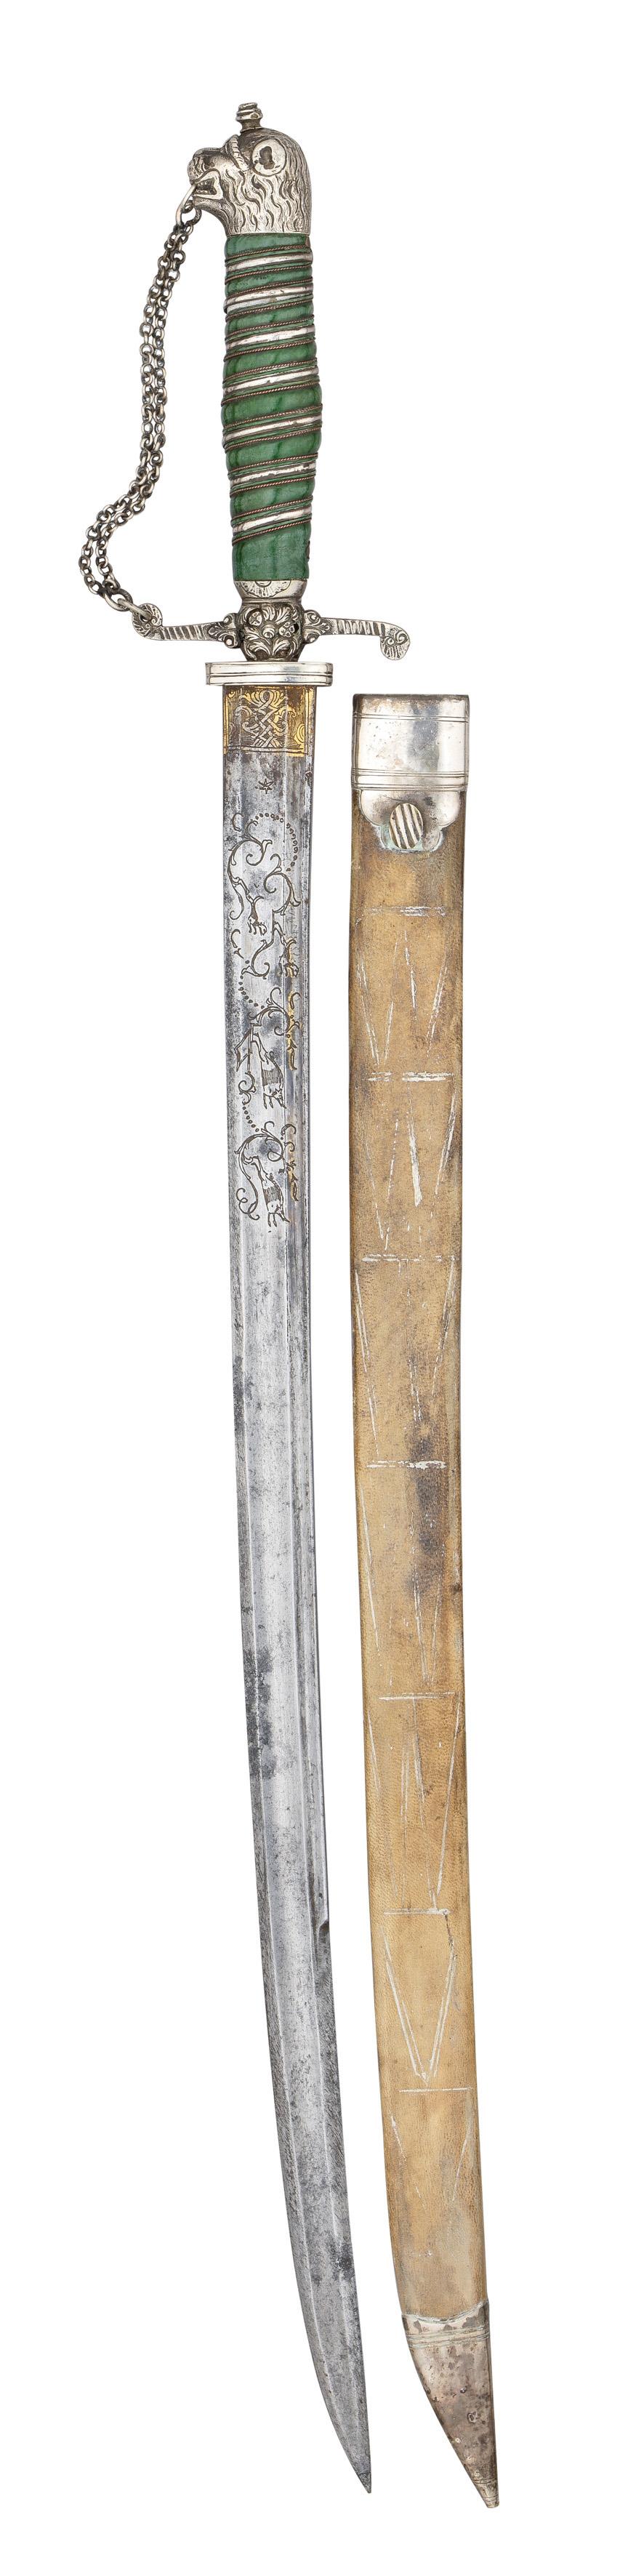 ˜Ⓦ AN ENGLISH SILVER-MOUNTED HUNTING SWORD^ CIRCA 1770